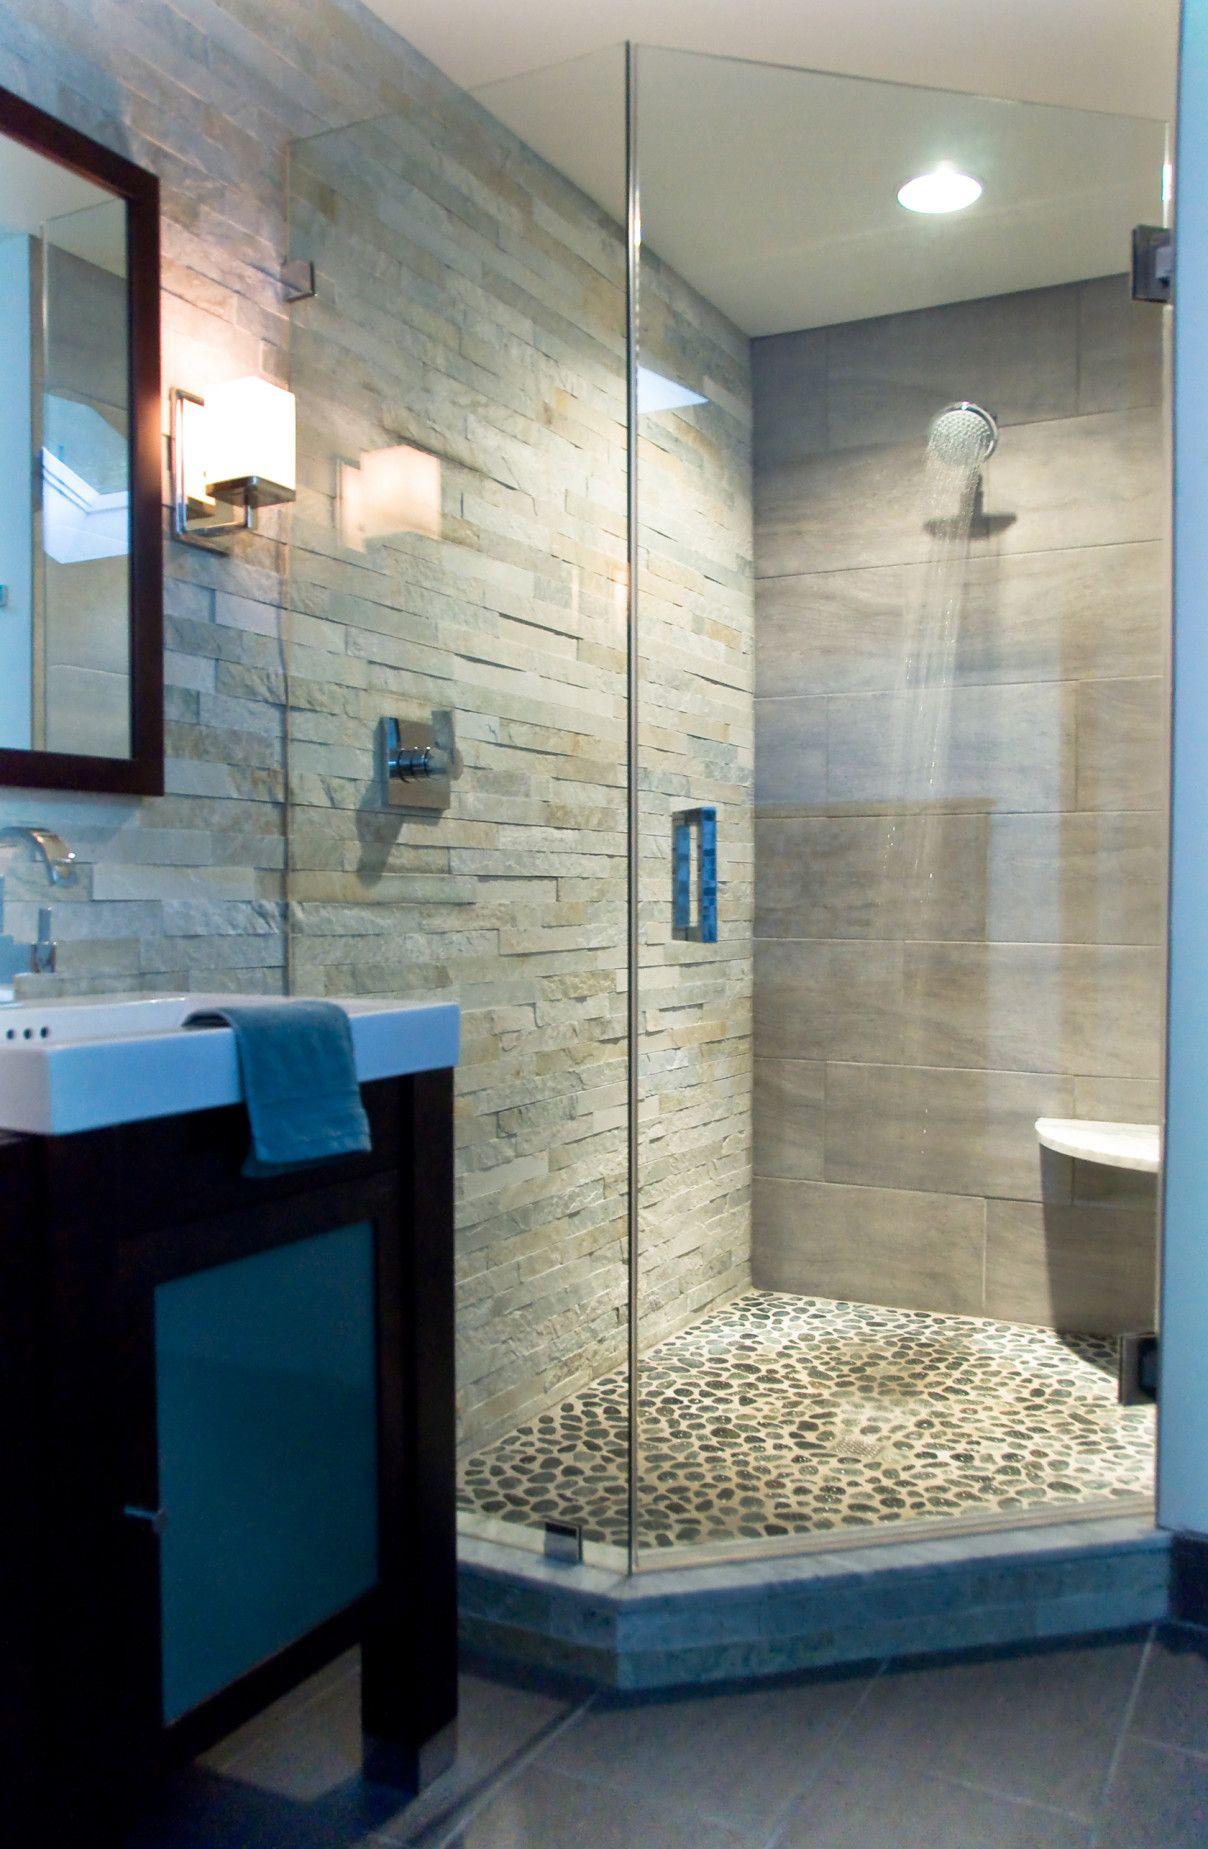 Pin by Katherine Ventker on Spa Bathroom Ideas